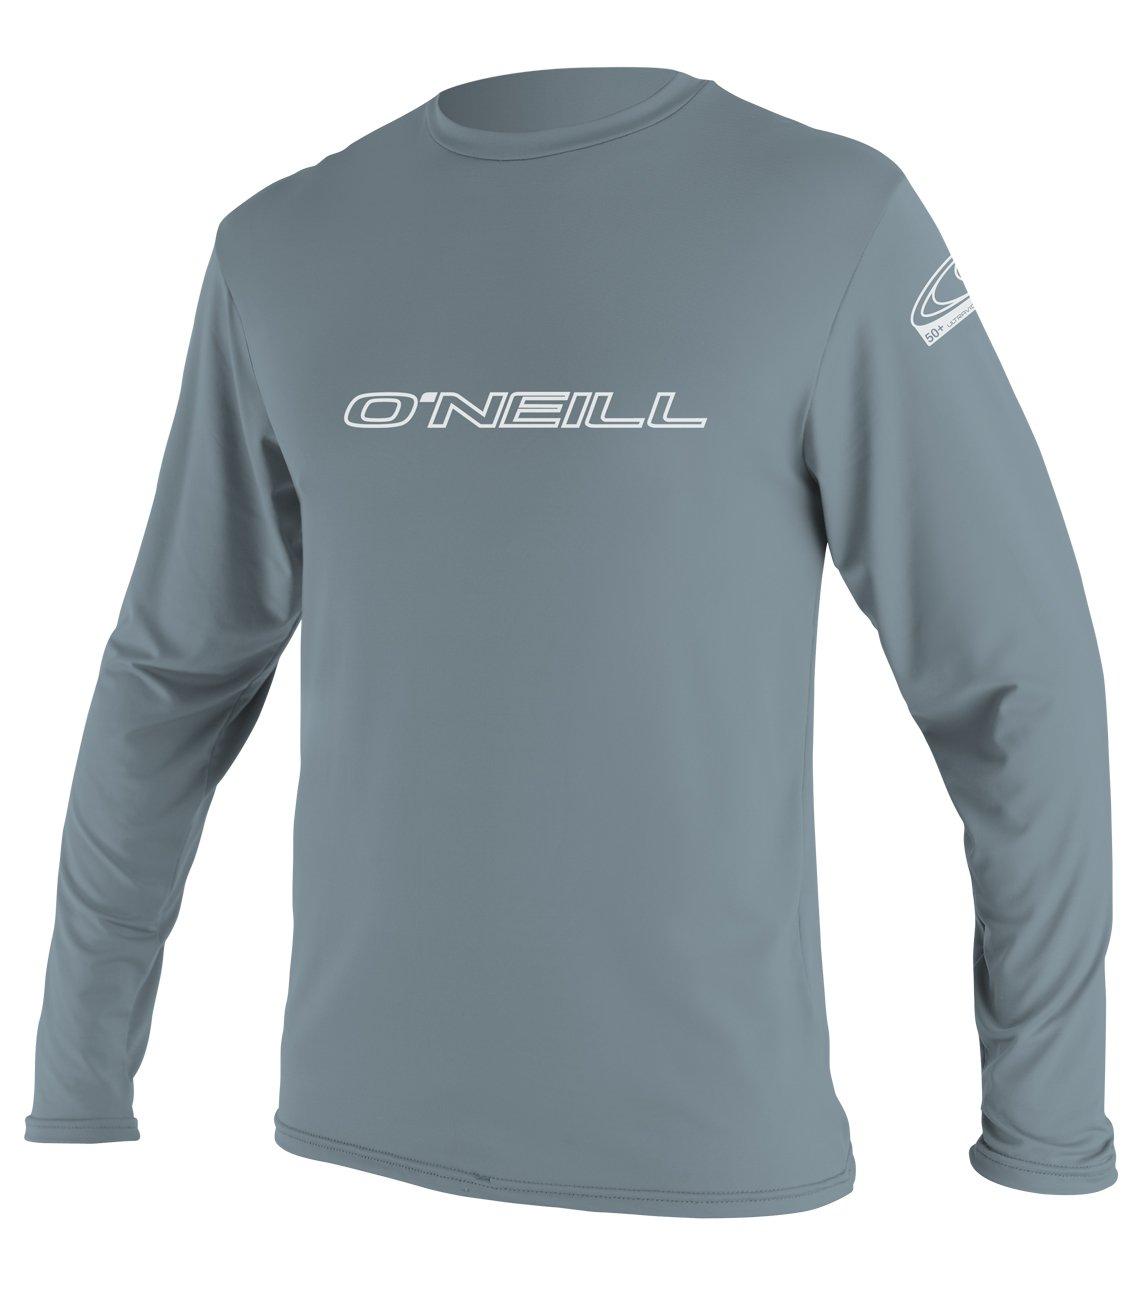 O'Neill Wetsuits Men's Basic Skins UPF 50+ Long Sleeve Sun Shirt, Dusty Blue, Medium